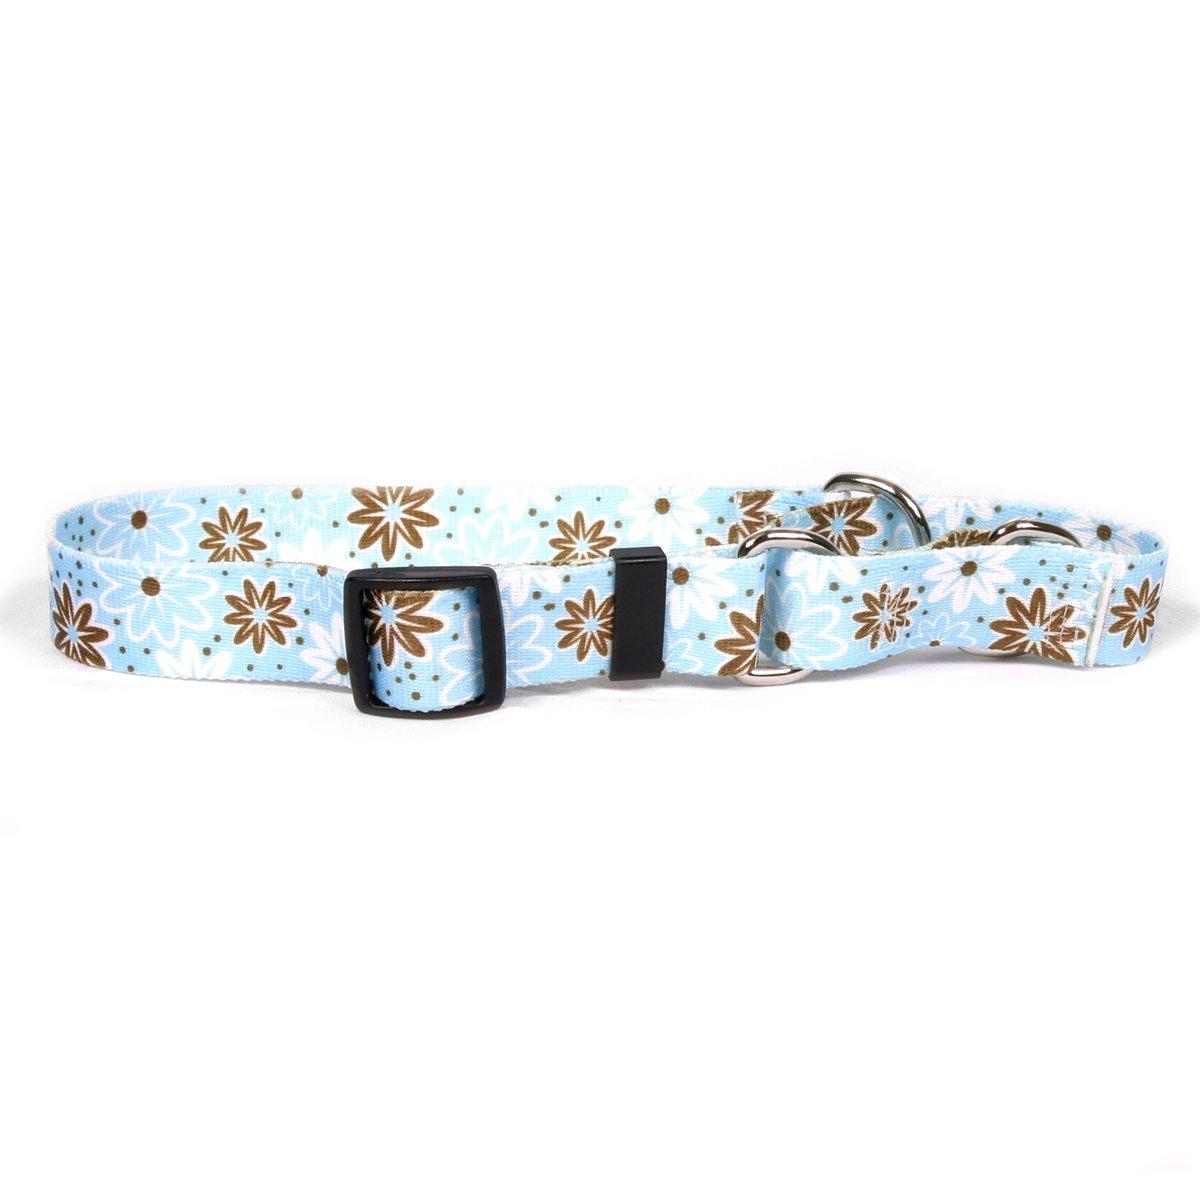 Yellow Dog Design Martingale Slip Collar, Daisy Chain Blue, Medium 20'' by Yellow Dog Design (Image #1)